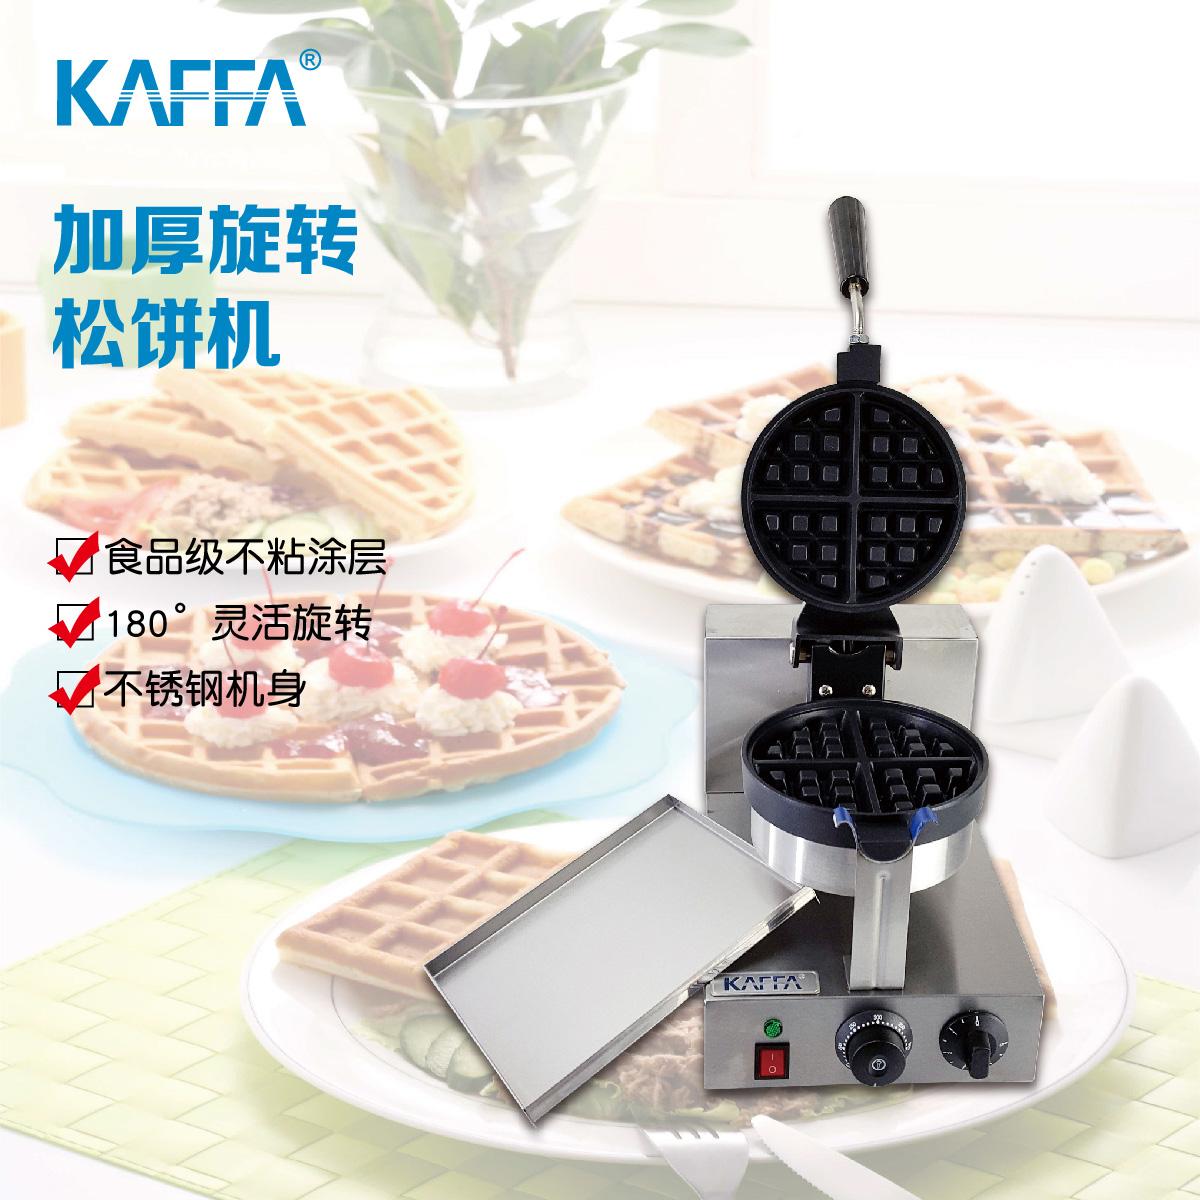 kaffa卡法商用加厚旋转电热松饼机